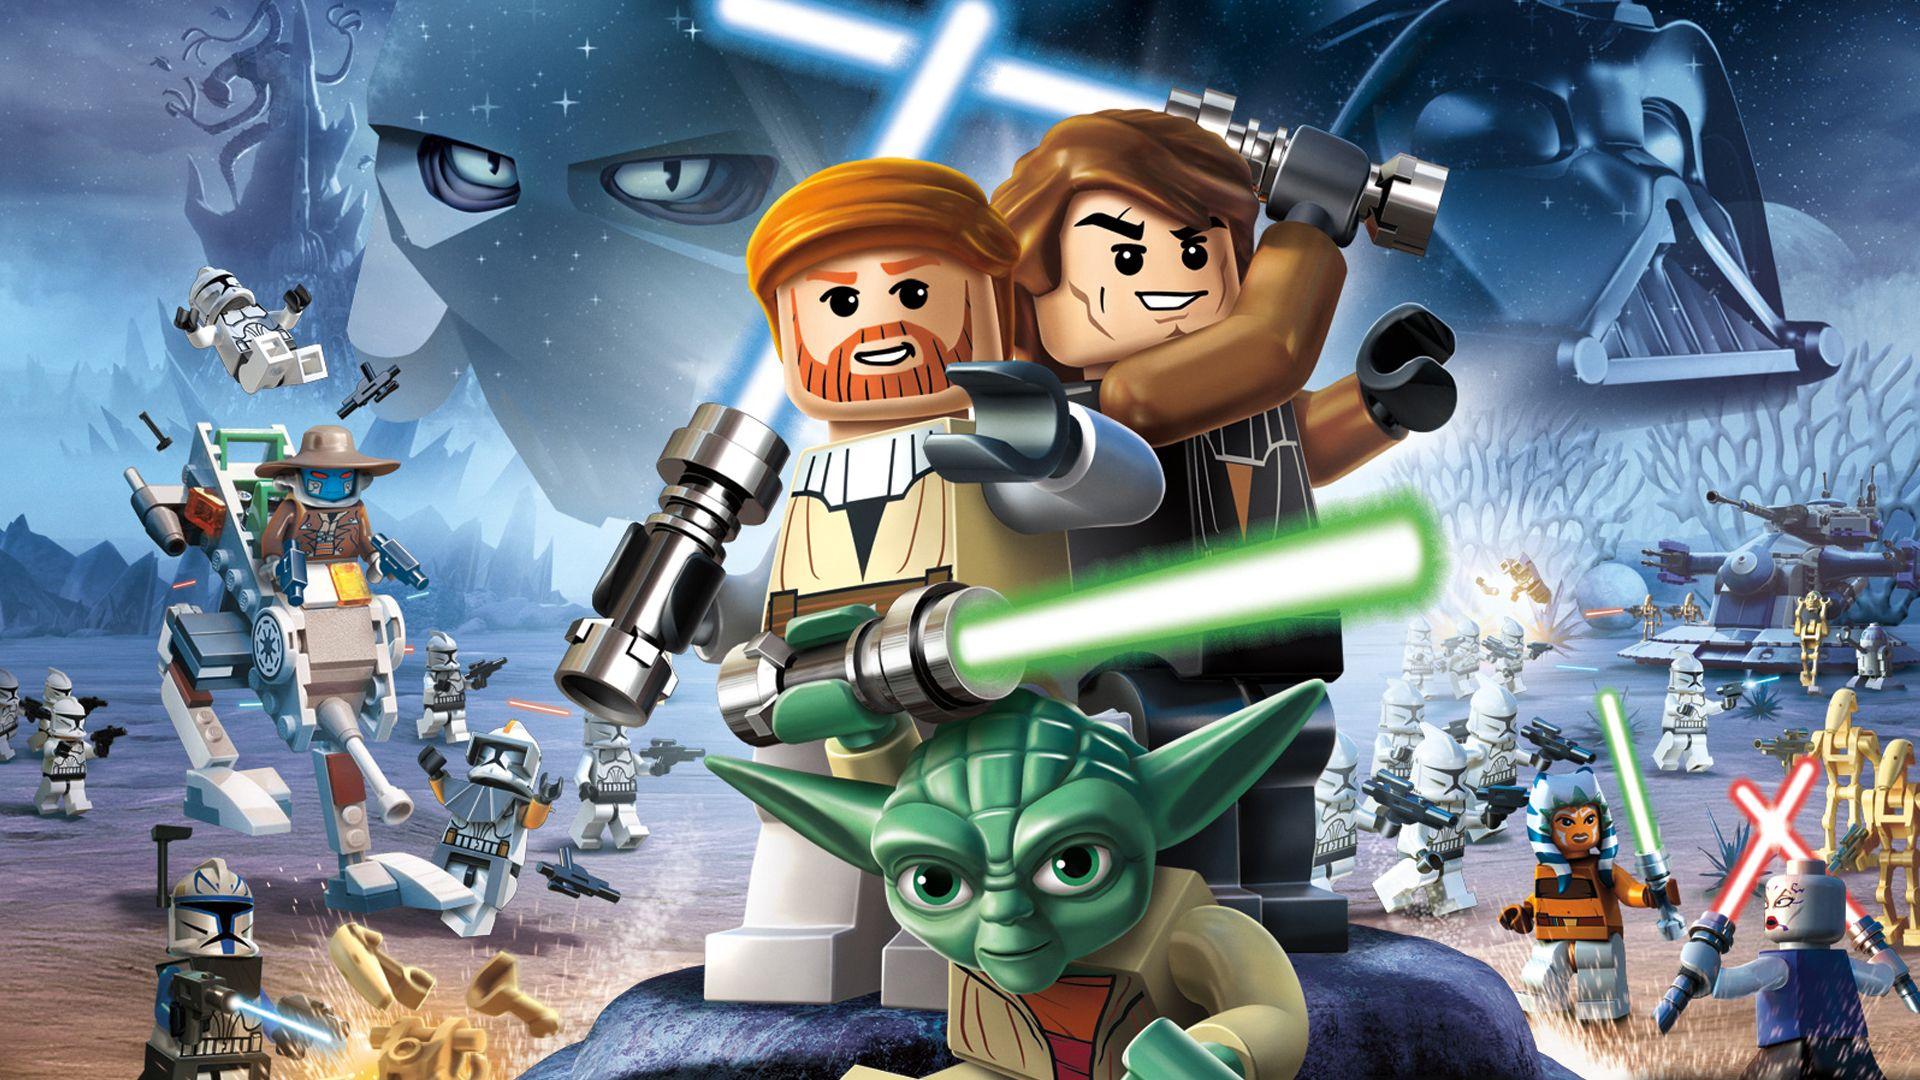 Lego star wars iii the clone wars vehicle info - Cartoon Violence Crude Humor